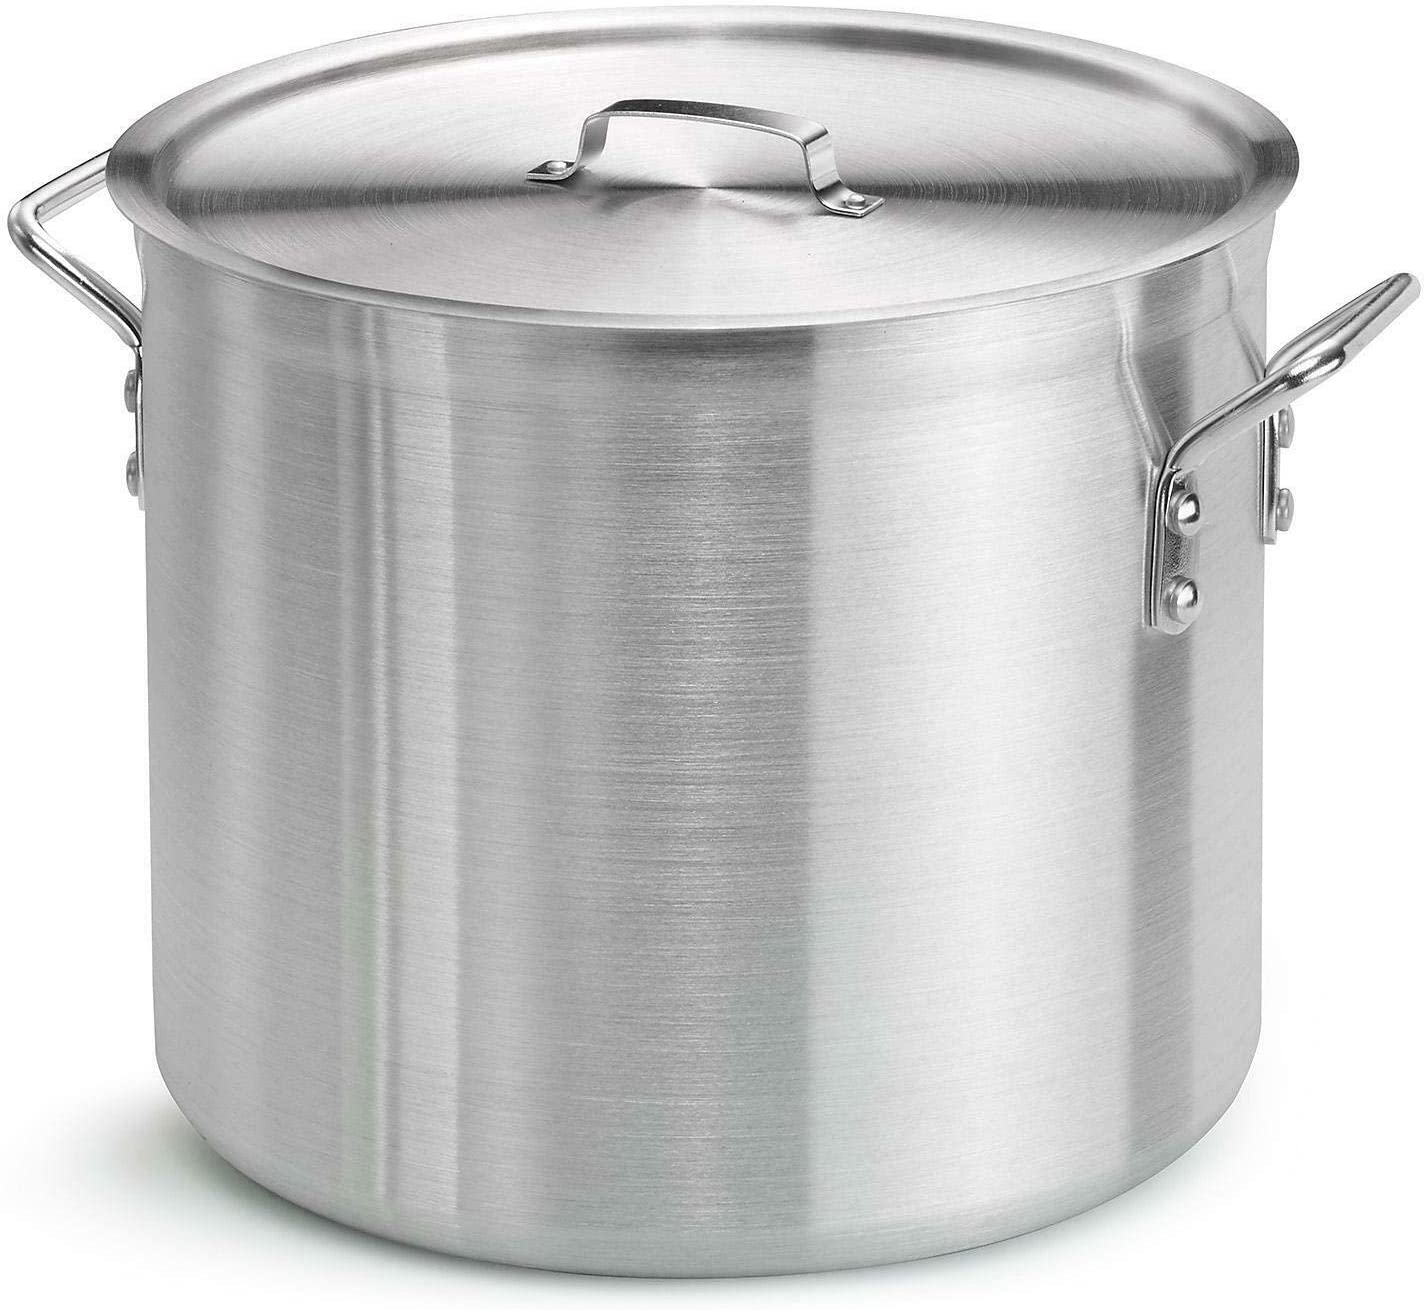 An Item of Member's Mark 24-Qt. Covered Aluminum Stock Pot